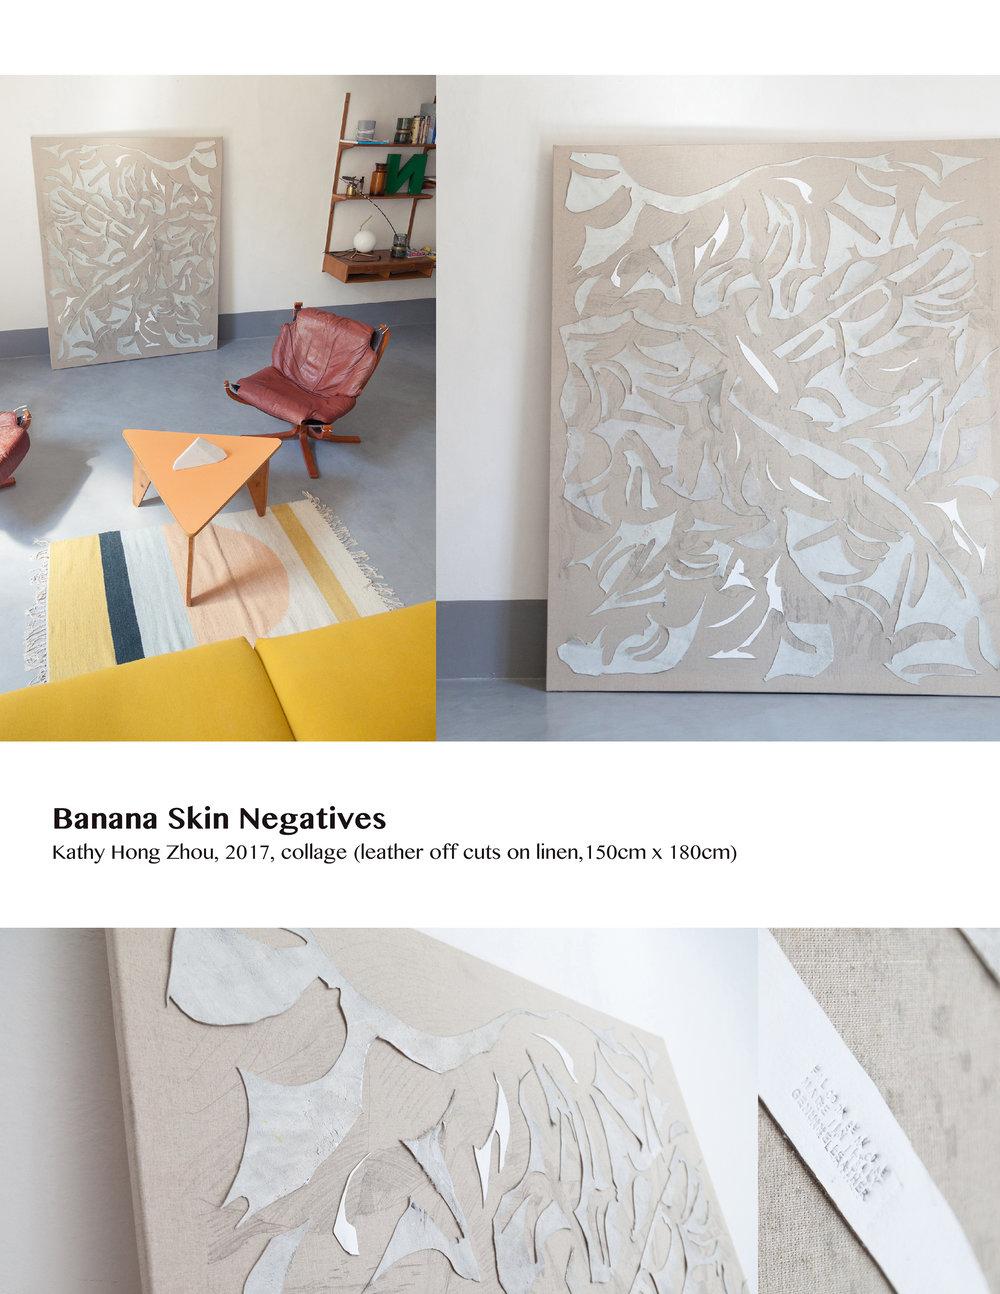 Zhou_Kathy Hong_Banana Skin Negatives_150cm x 180cm.jpg